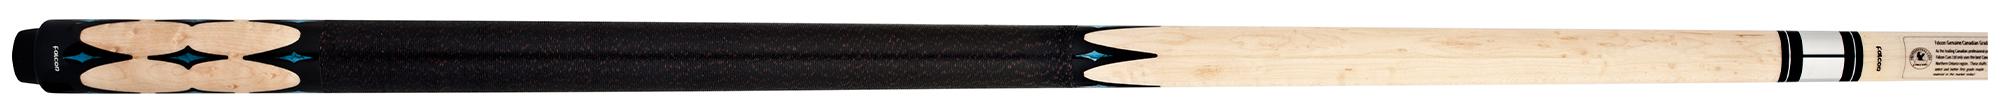 PK0706-1: Falcon ® poolkeu MP-1 #1